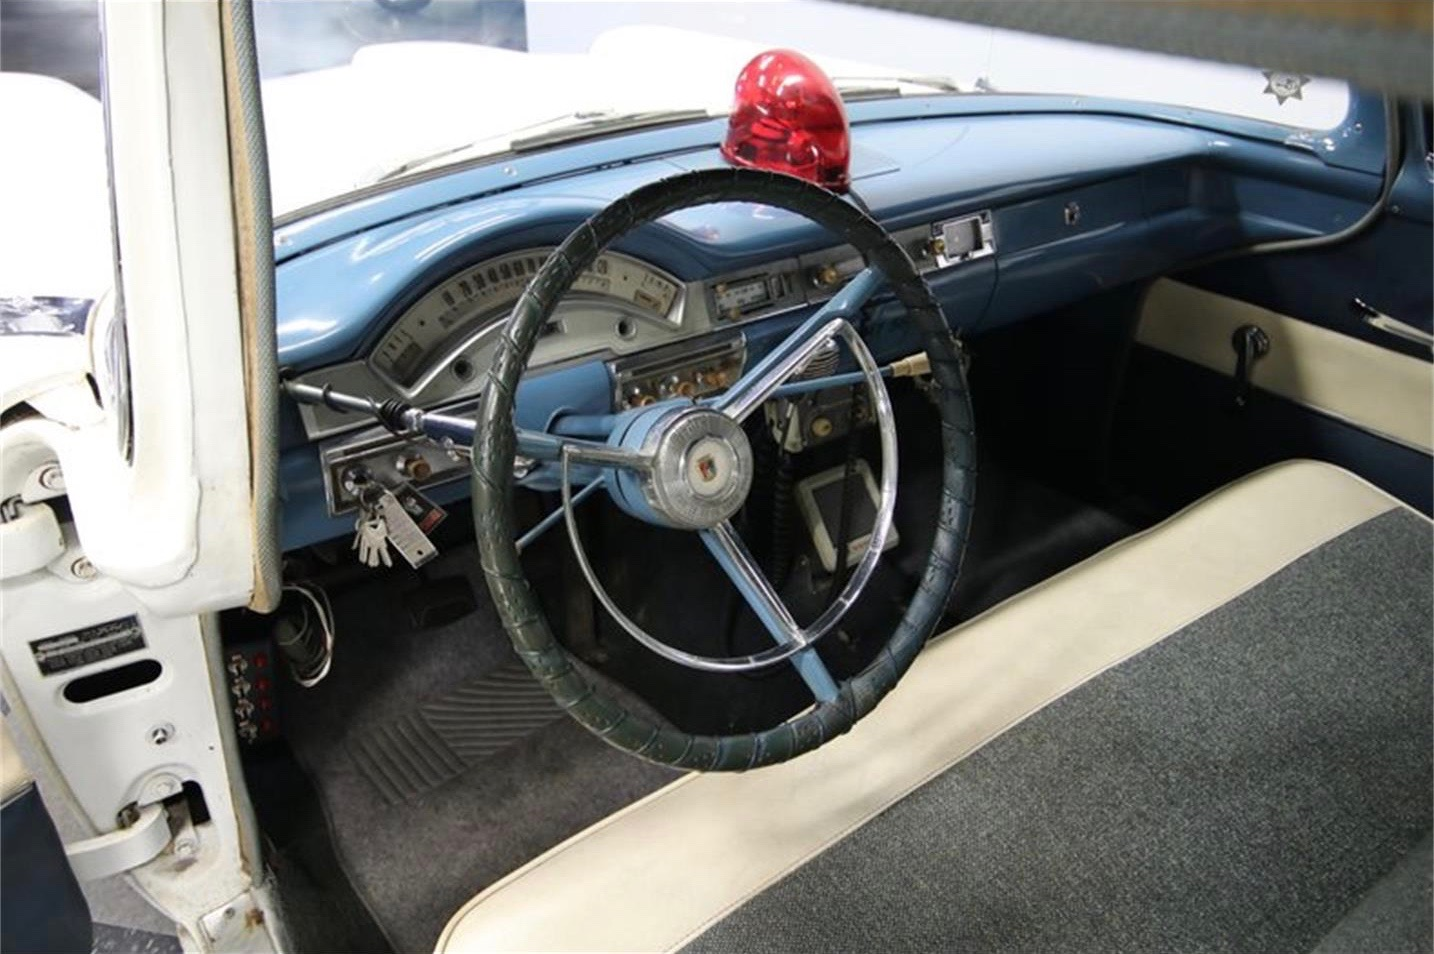 Barney Fife, Here's a car for your inner Barney Fife, ClassicCars.com Journal